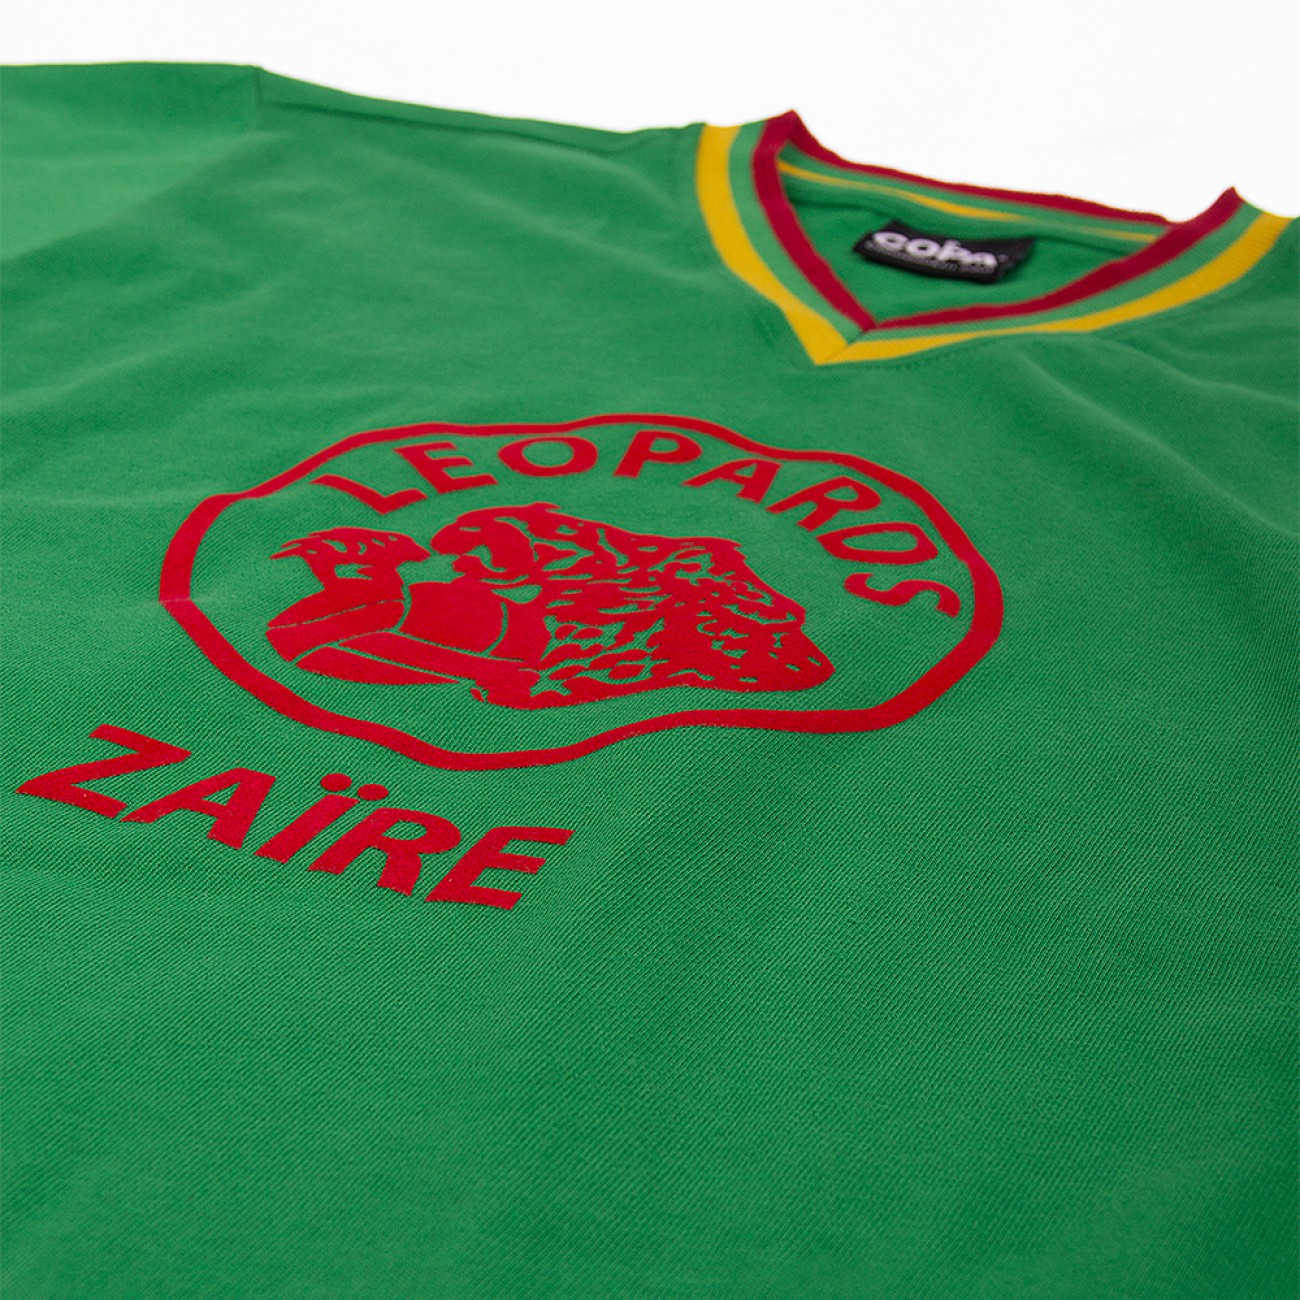 9cd32f981a3 Zaire Classic shirt 1974 WC qualifiers